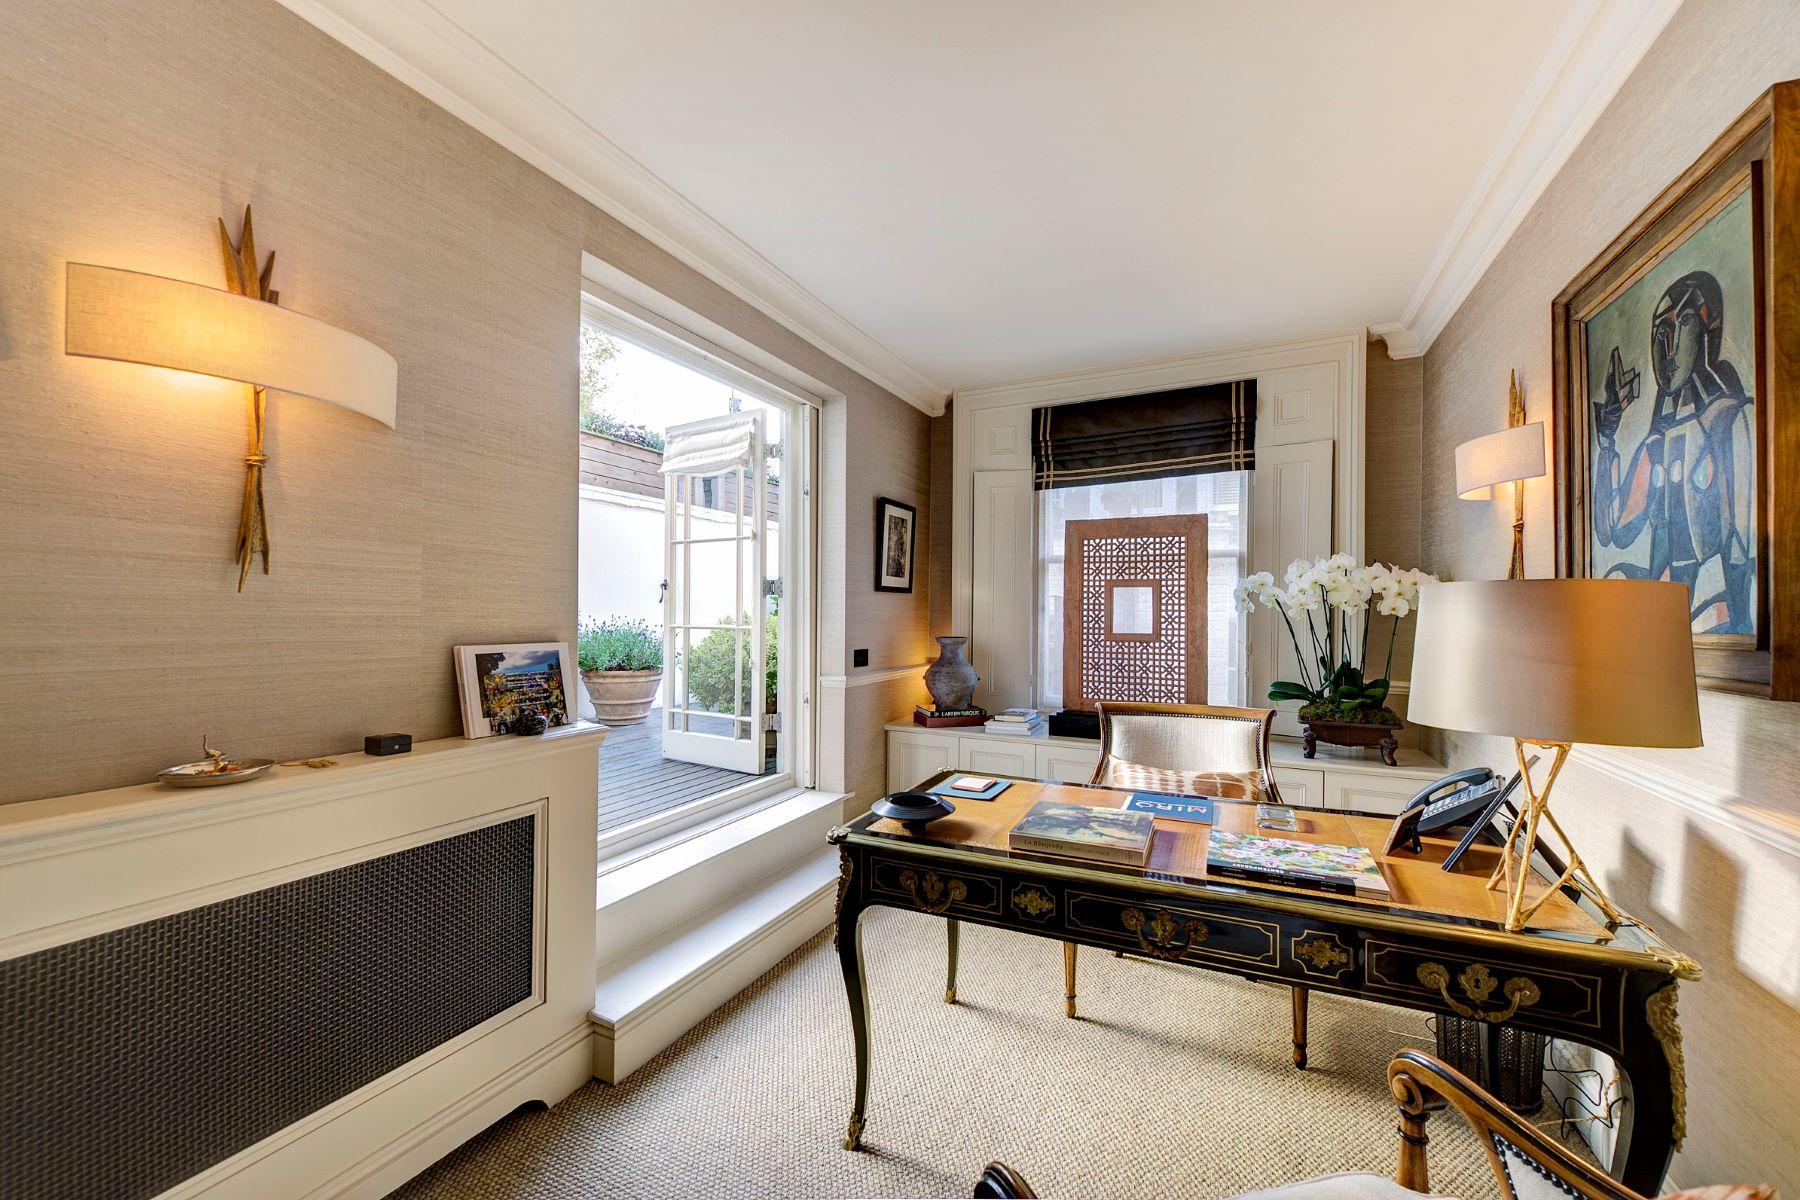 Additional photo for property listing at 20 Wilton Place Knightsbridge London, England SW1X 8RL United Kingdom